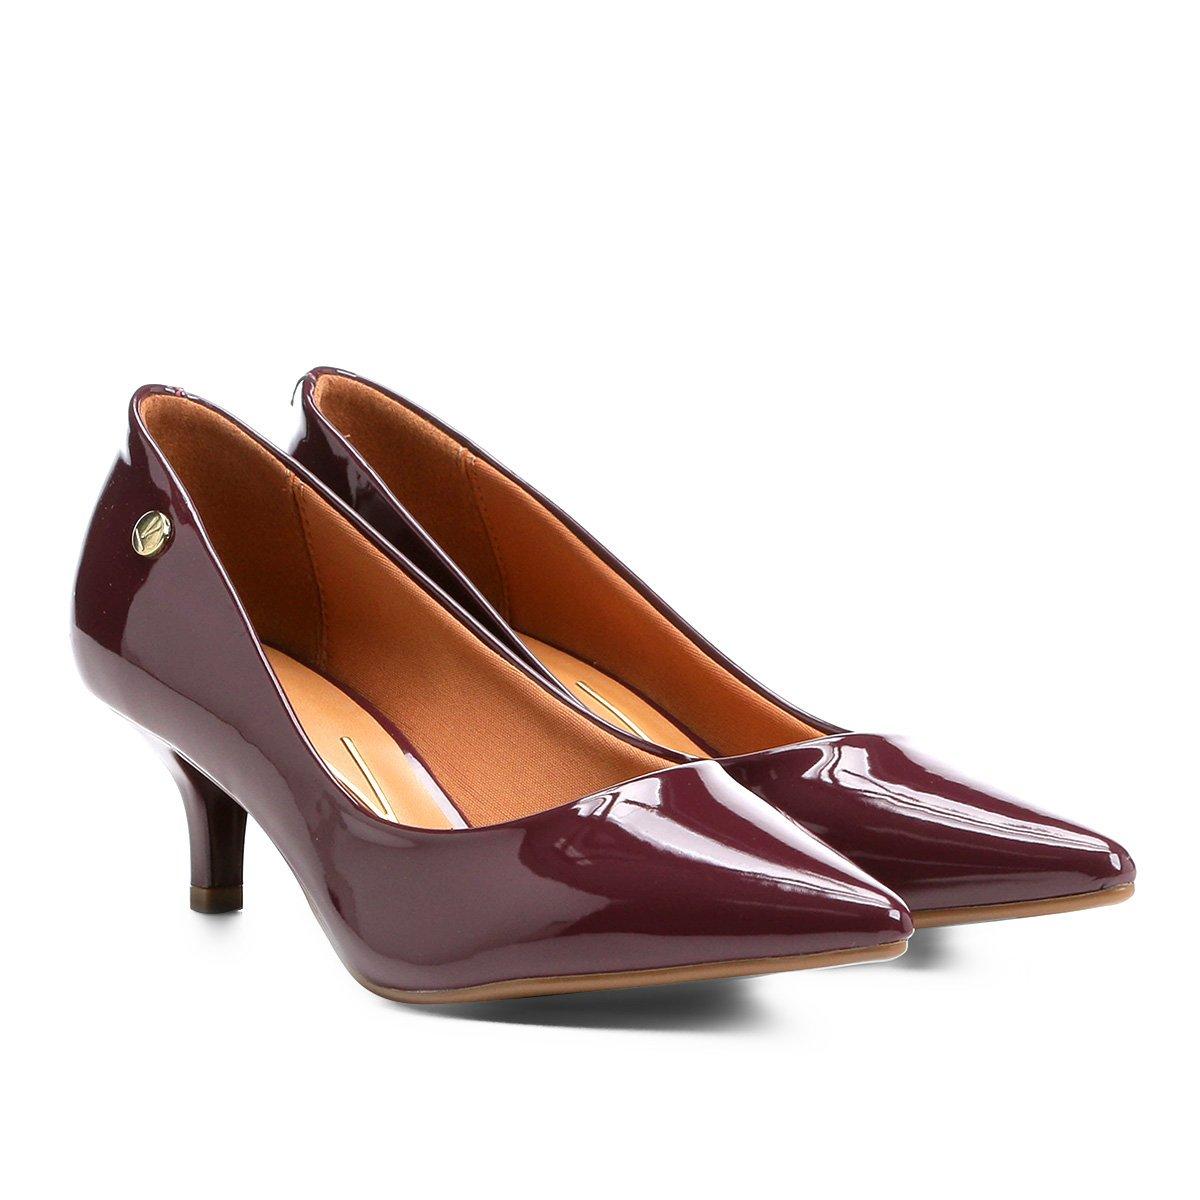 6720bd70b9 Sapato Scarpin Salto Baixo Bico Fino Verniz Vizzano